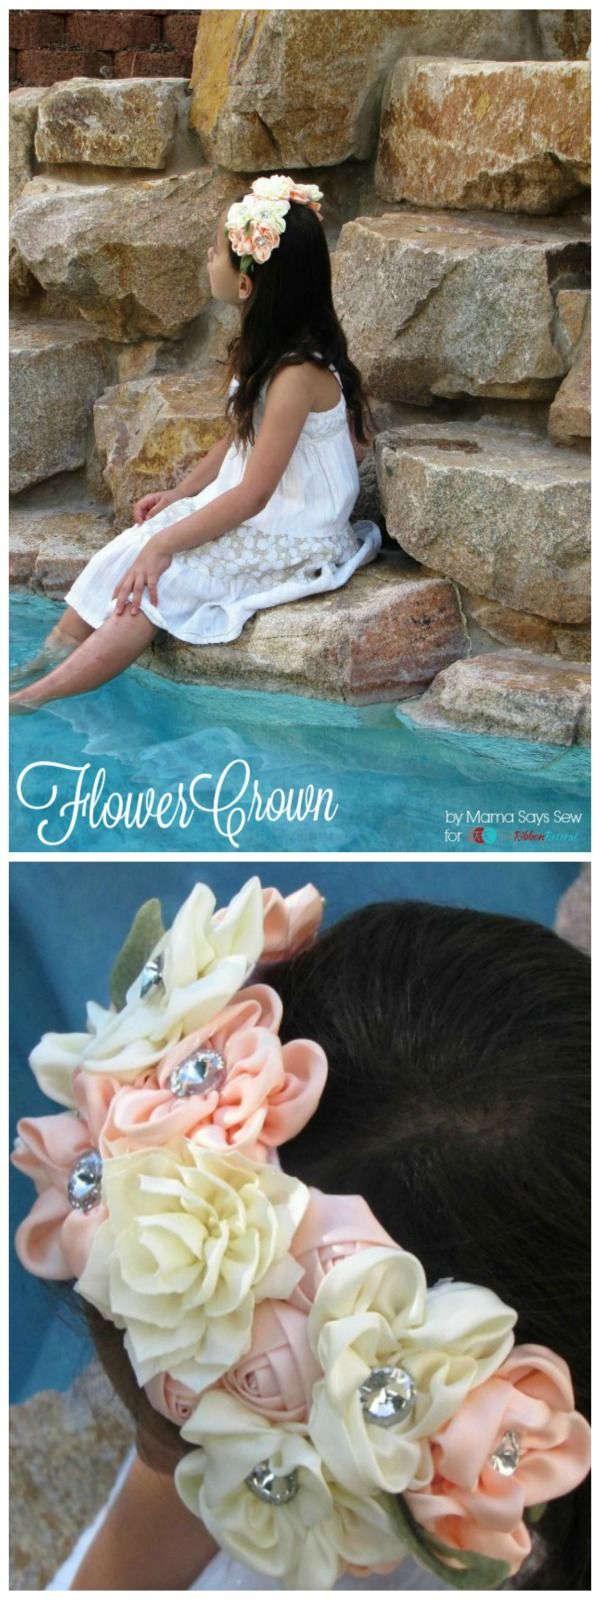 Flower Crown - The Ribbon Retreat Blog